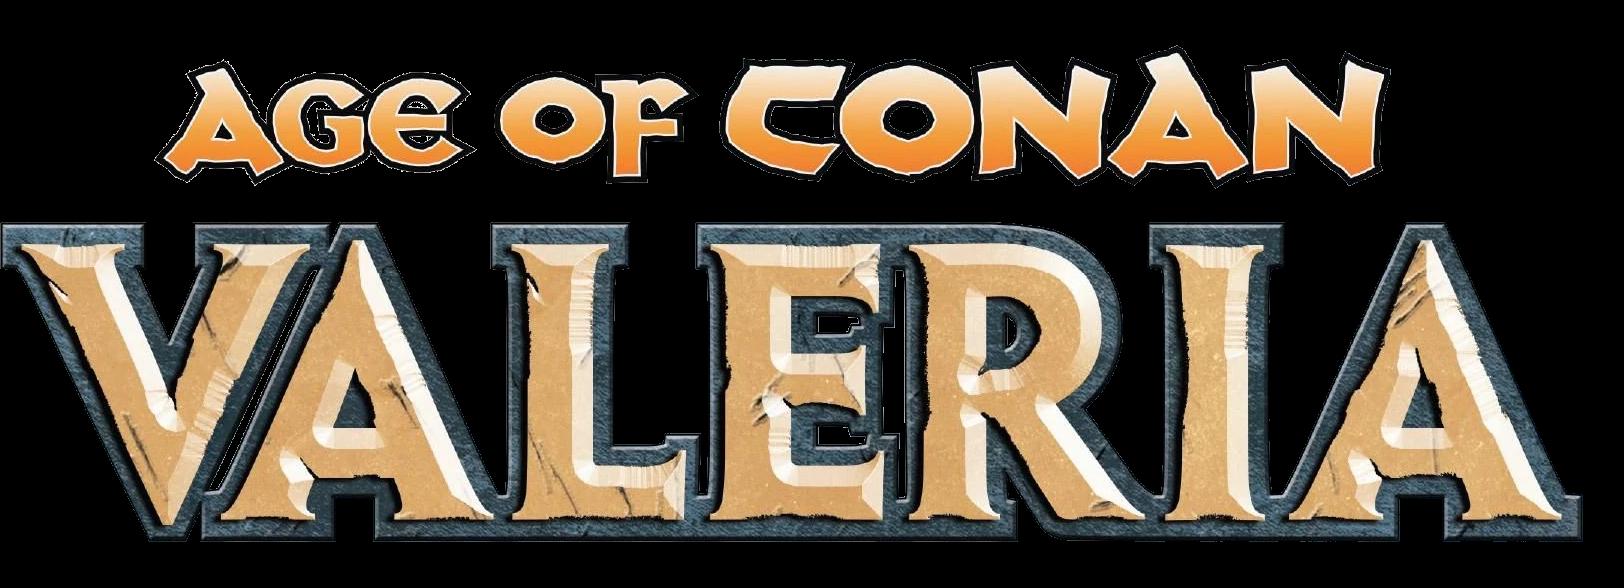 Age of Conan: Valeria TPB Vol 1